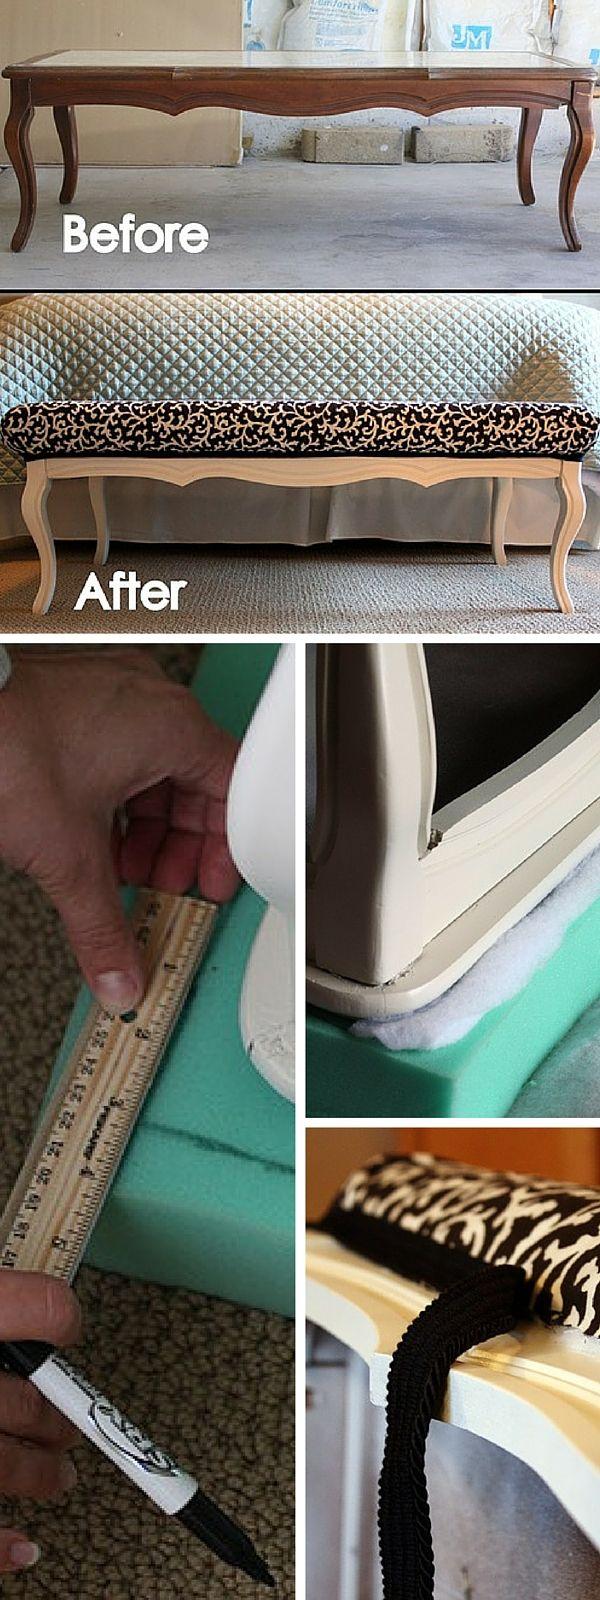 10 Amazing DIY Furniture Transformations